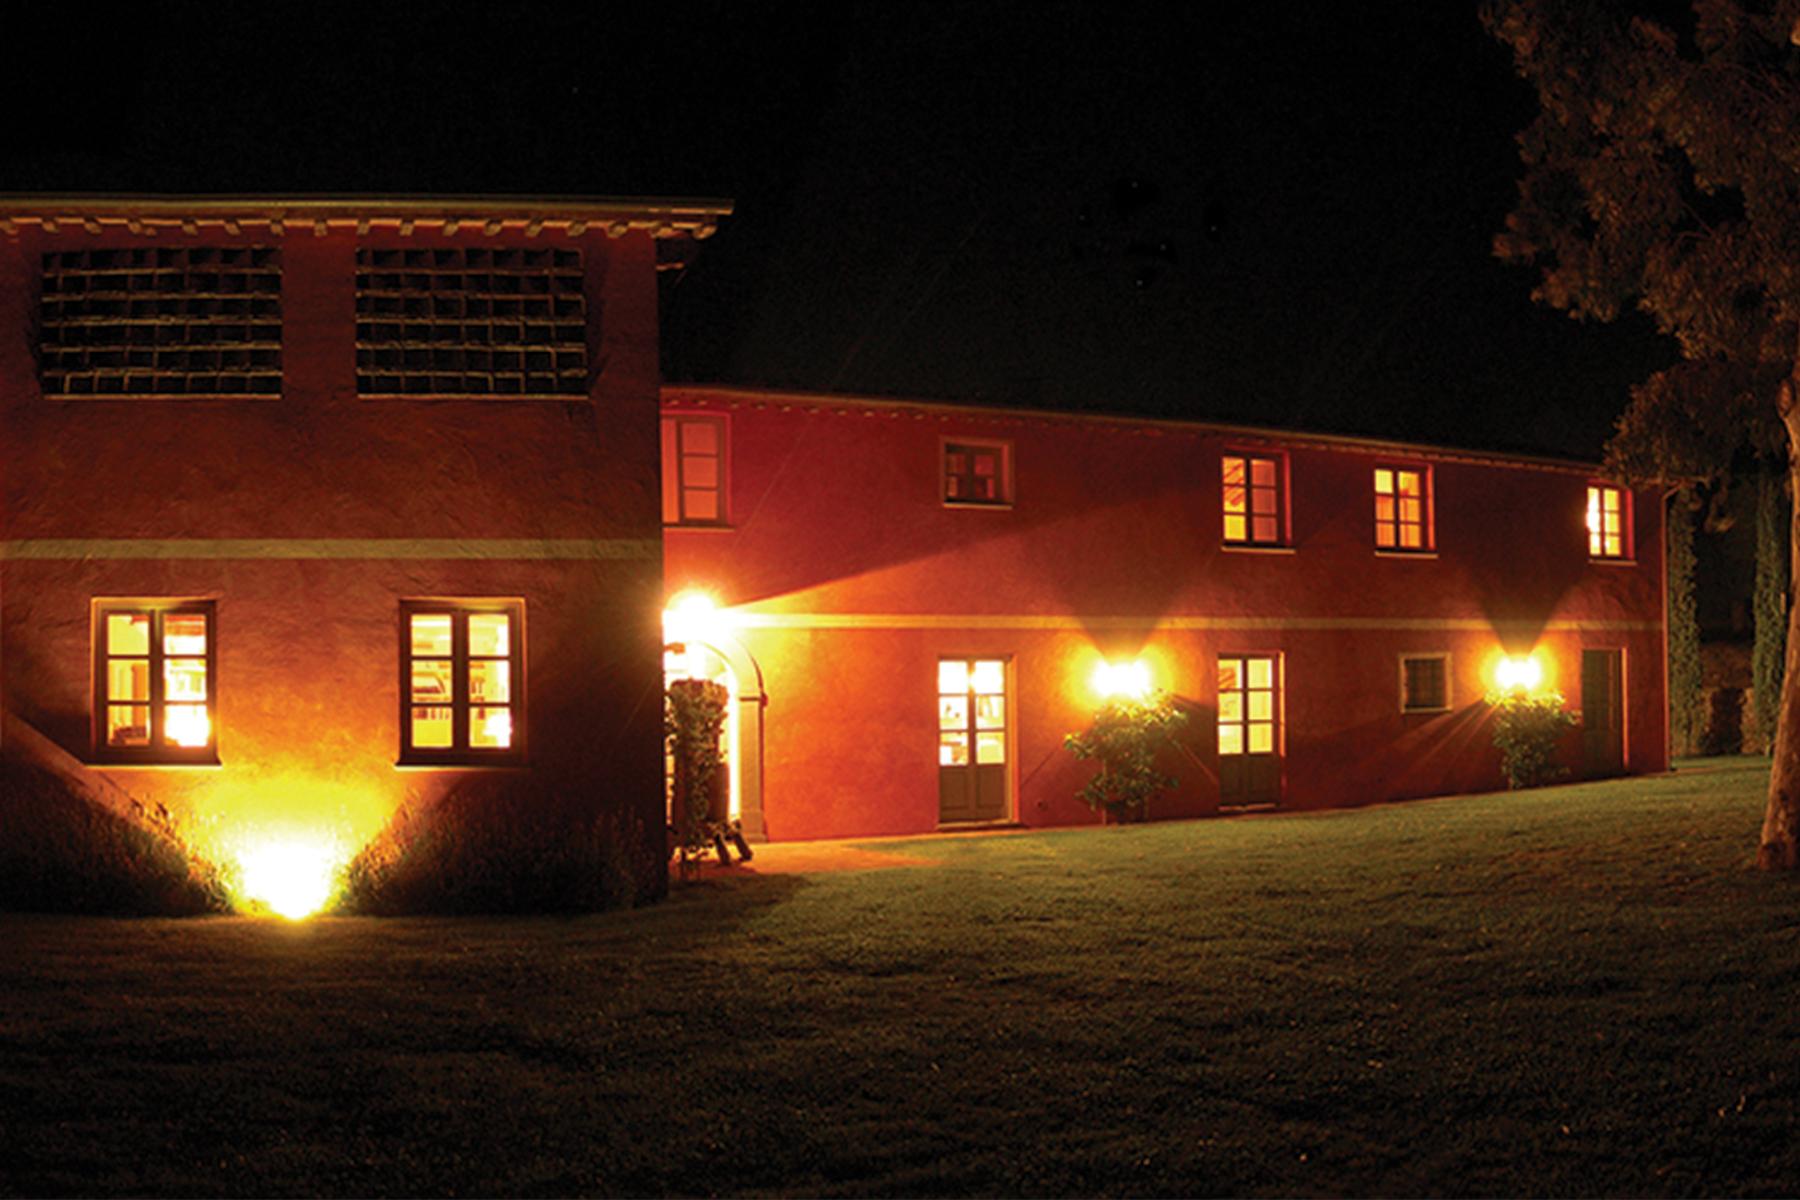 Casa indipendente in Vendita a Massarosa: 5 locali, 350 mq - Foto 12